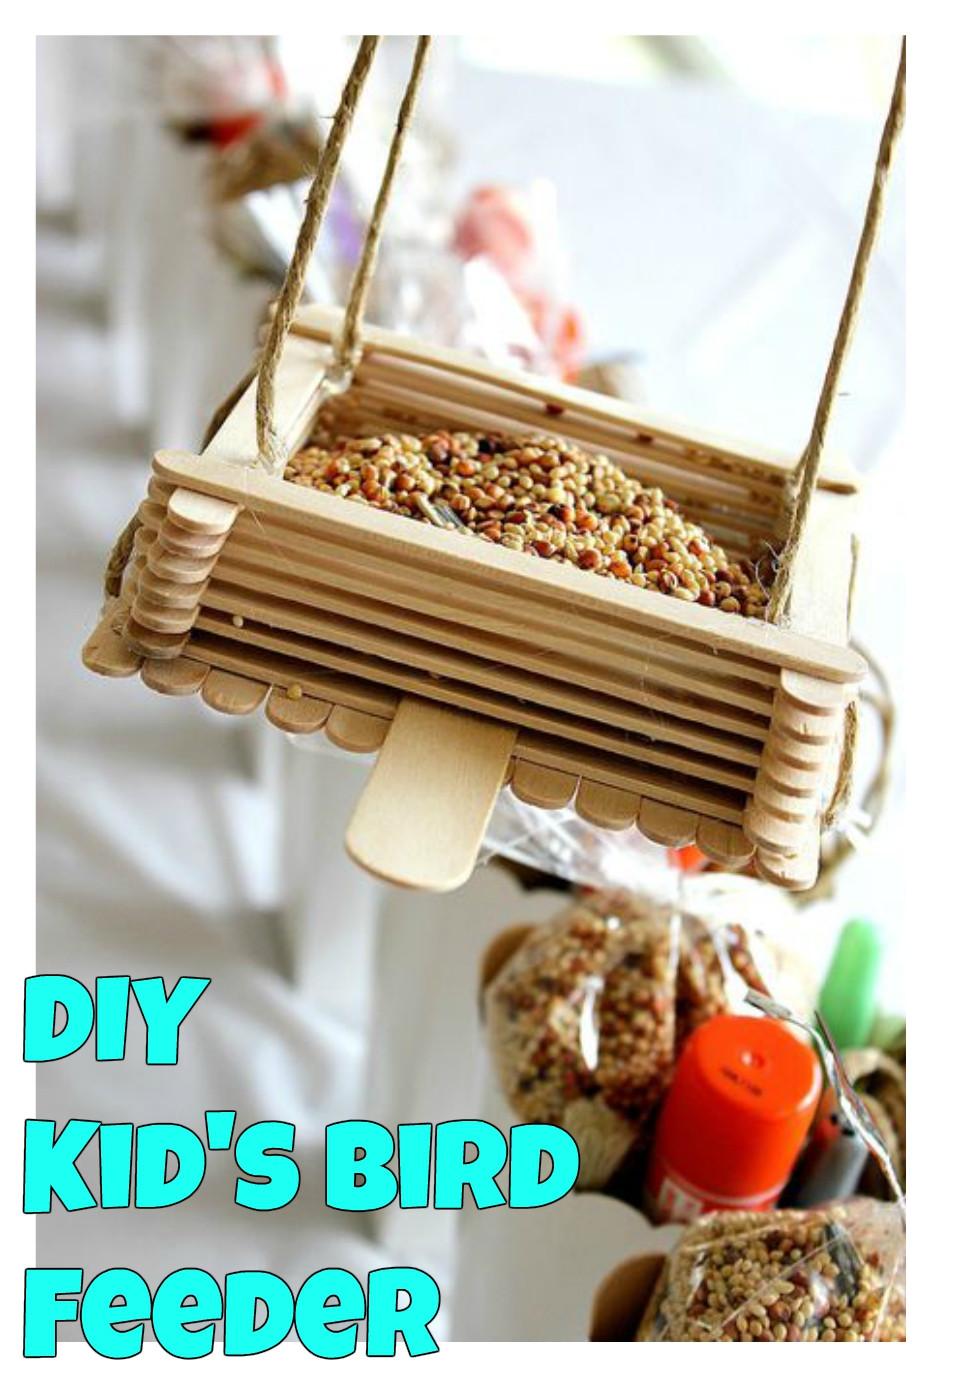 Best ideas about DIY Bird Feeders For Kids . Save or Pin DIY Kids Bird Feeder Super Simple Kid s Crafts Now.